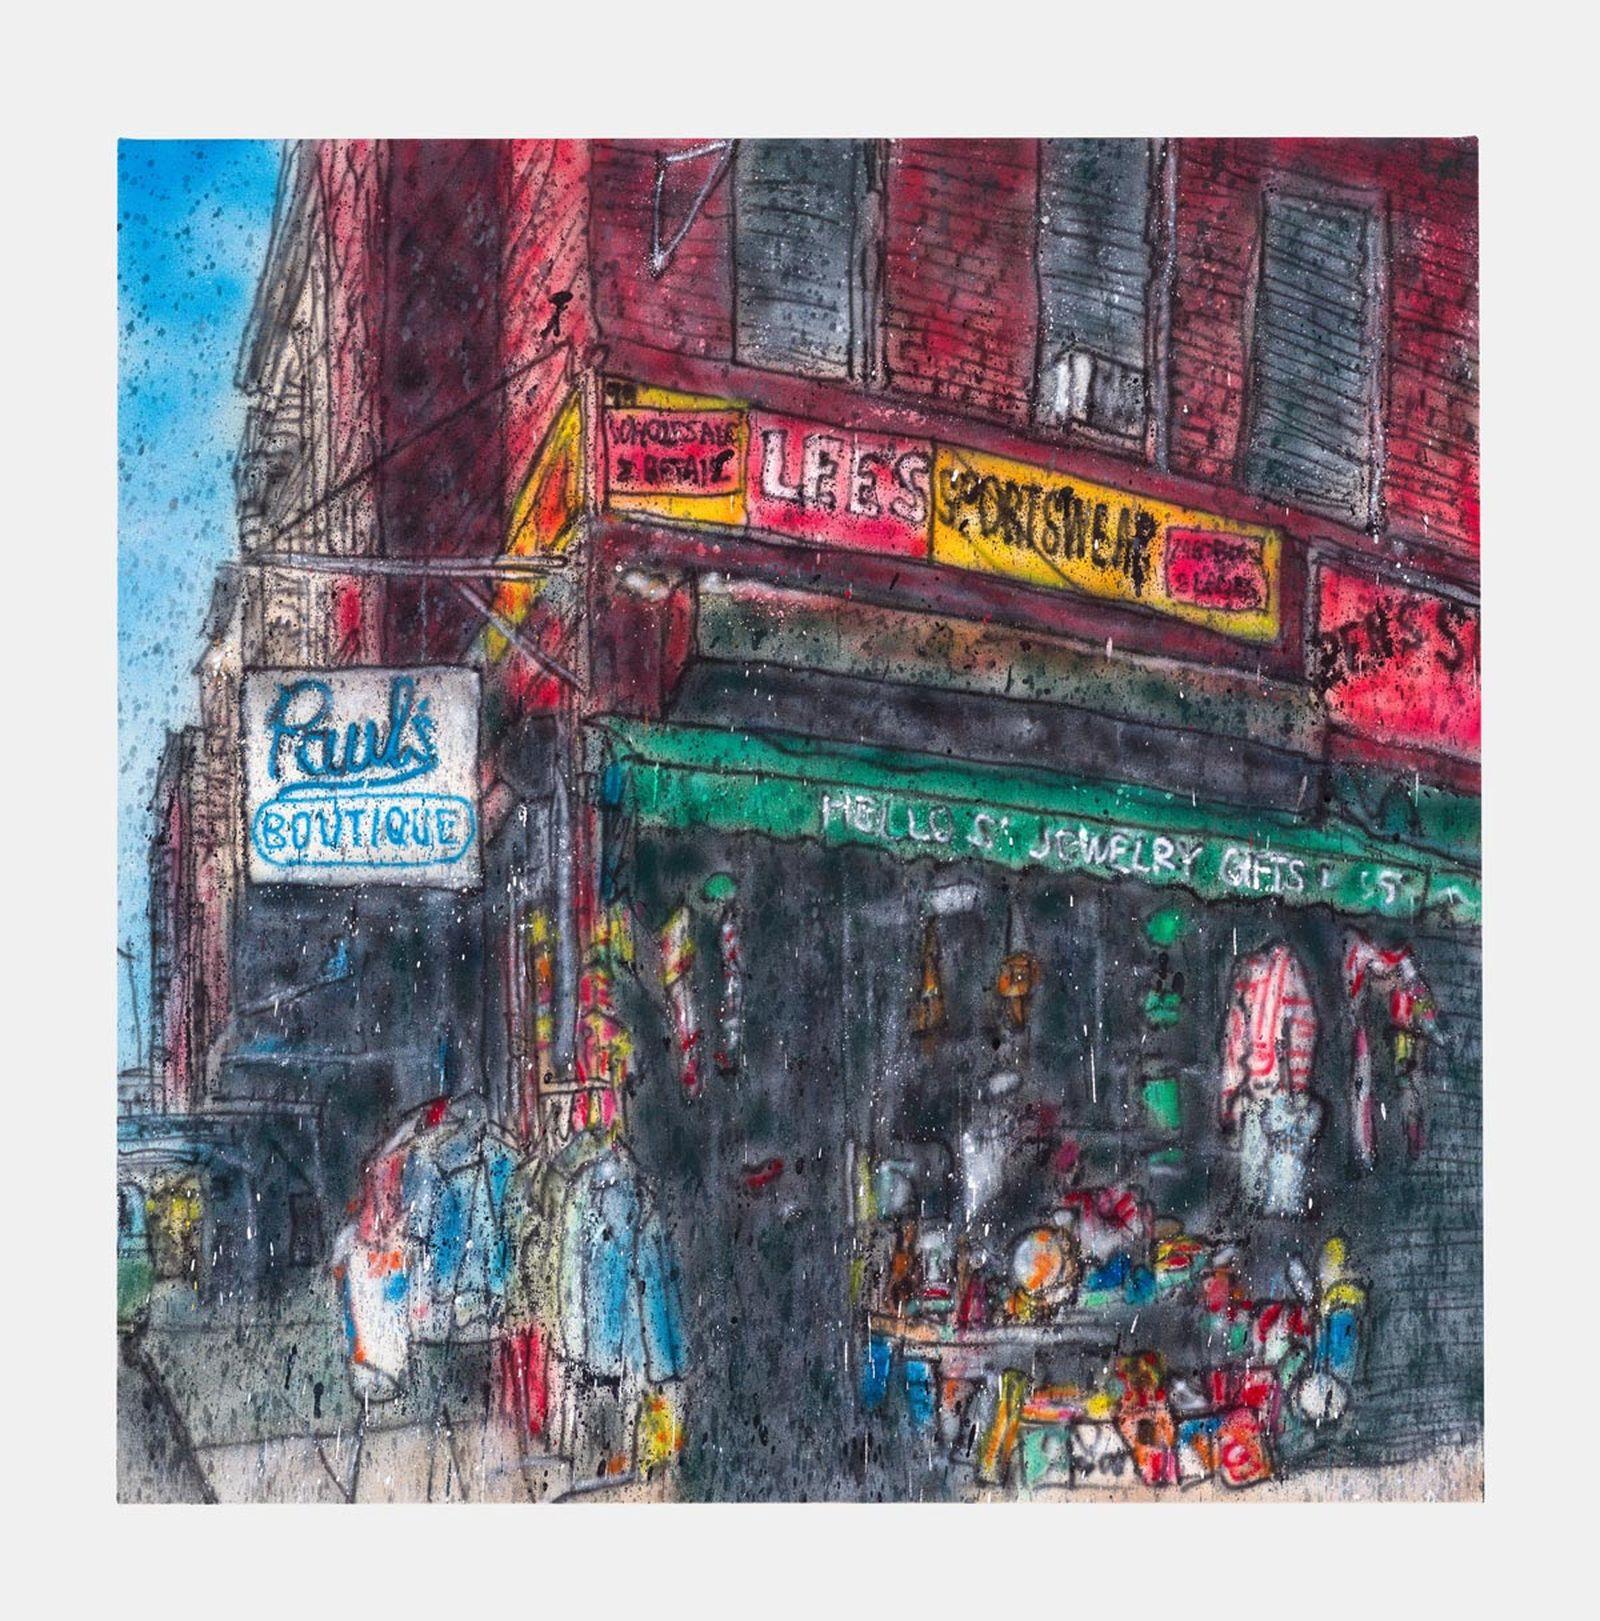 Untitled, 2020 Acrylic paint, aerosol on canvas 100 x 100 cm.